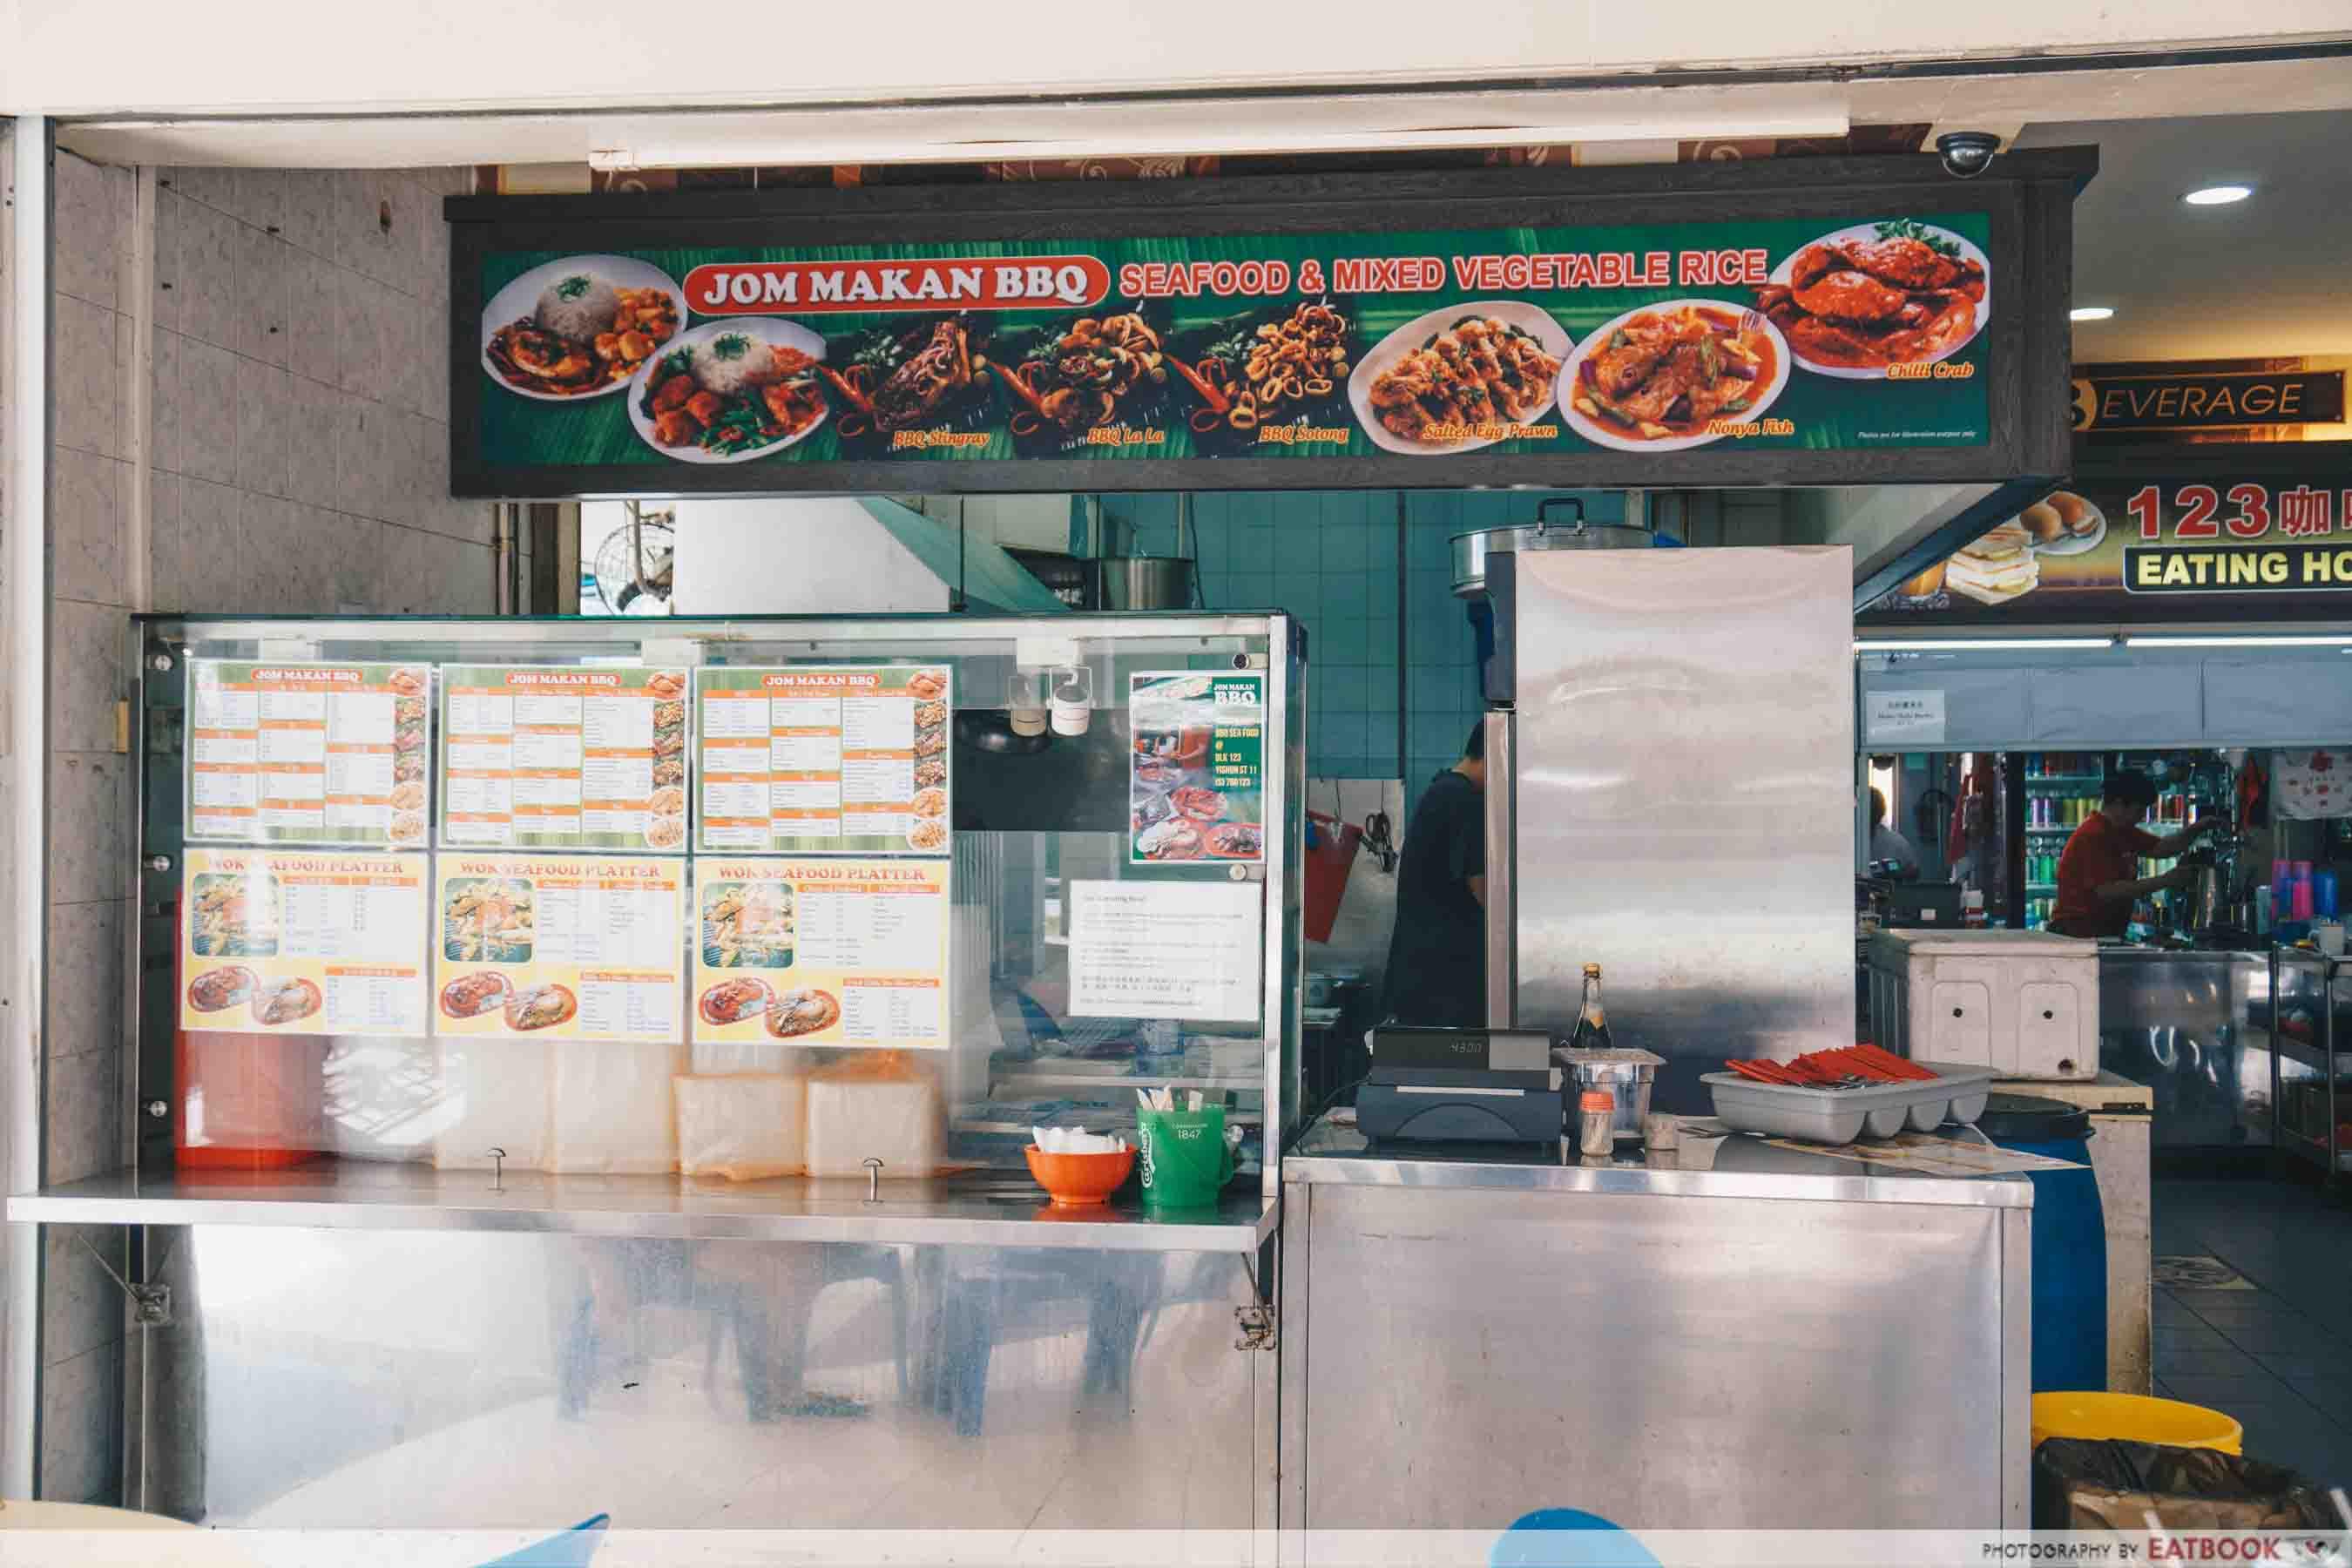 Jom Makan BBQ Seafood - Verdict